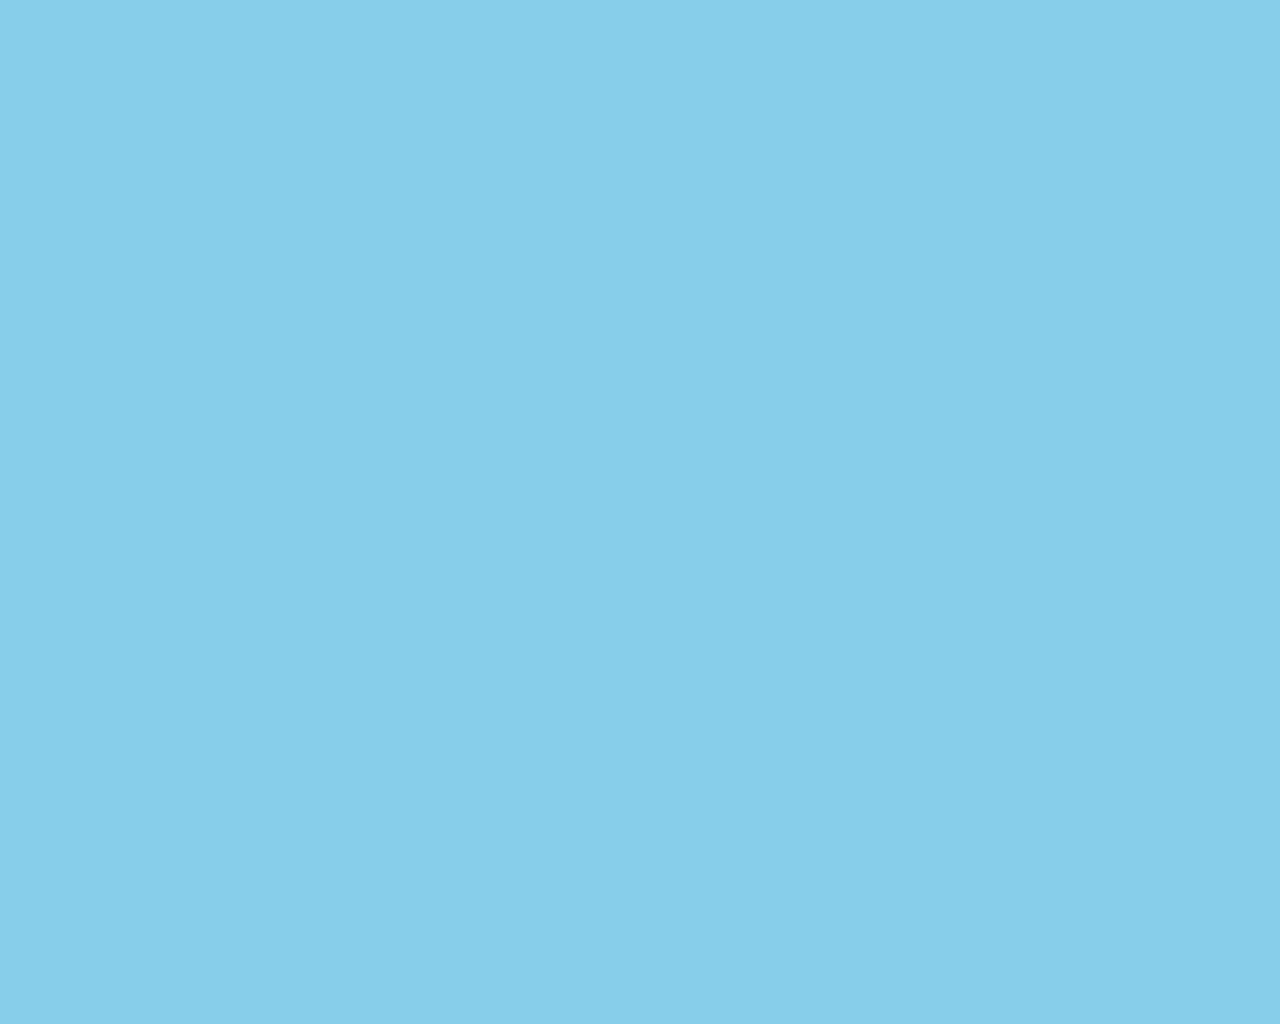 1280x1024 Sky Blue Solid Color Background